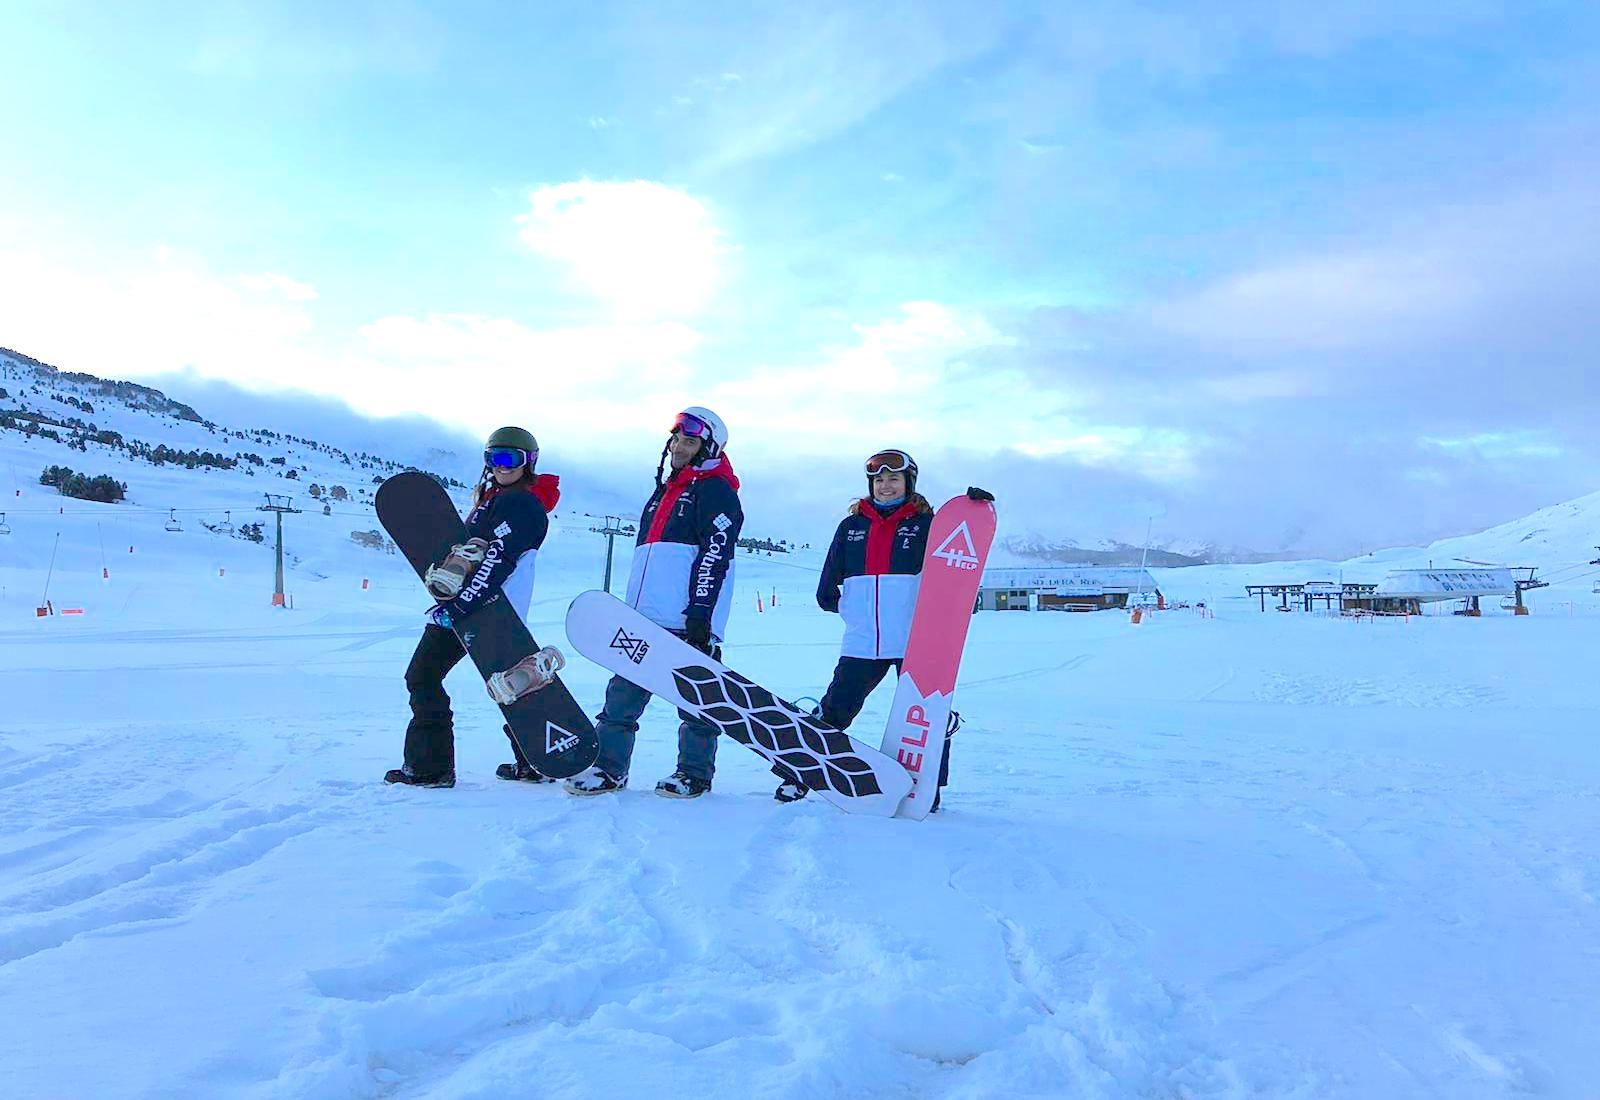 cdia_snowboard_adaptado